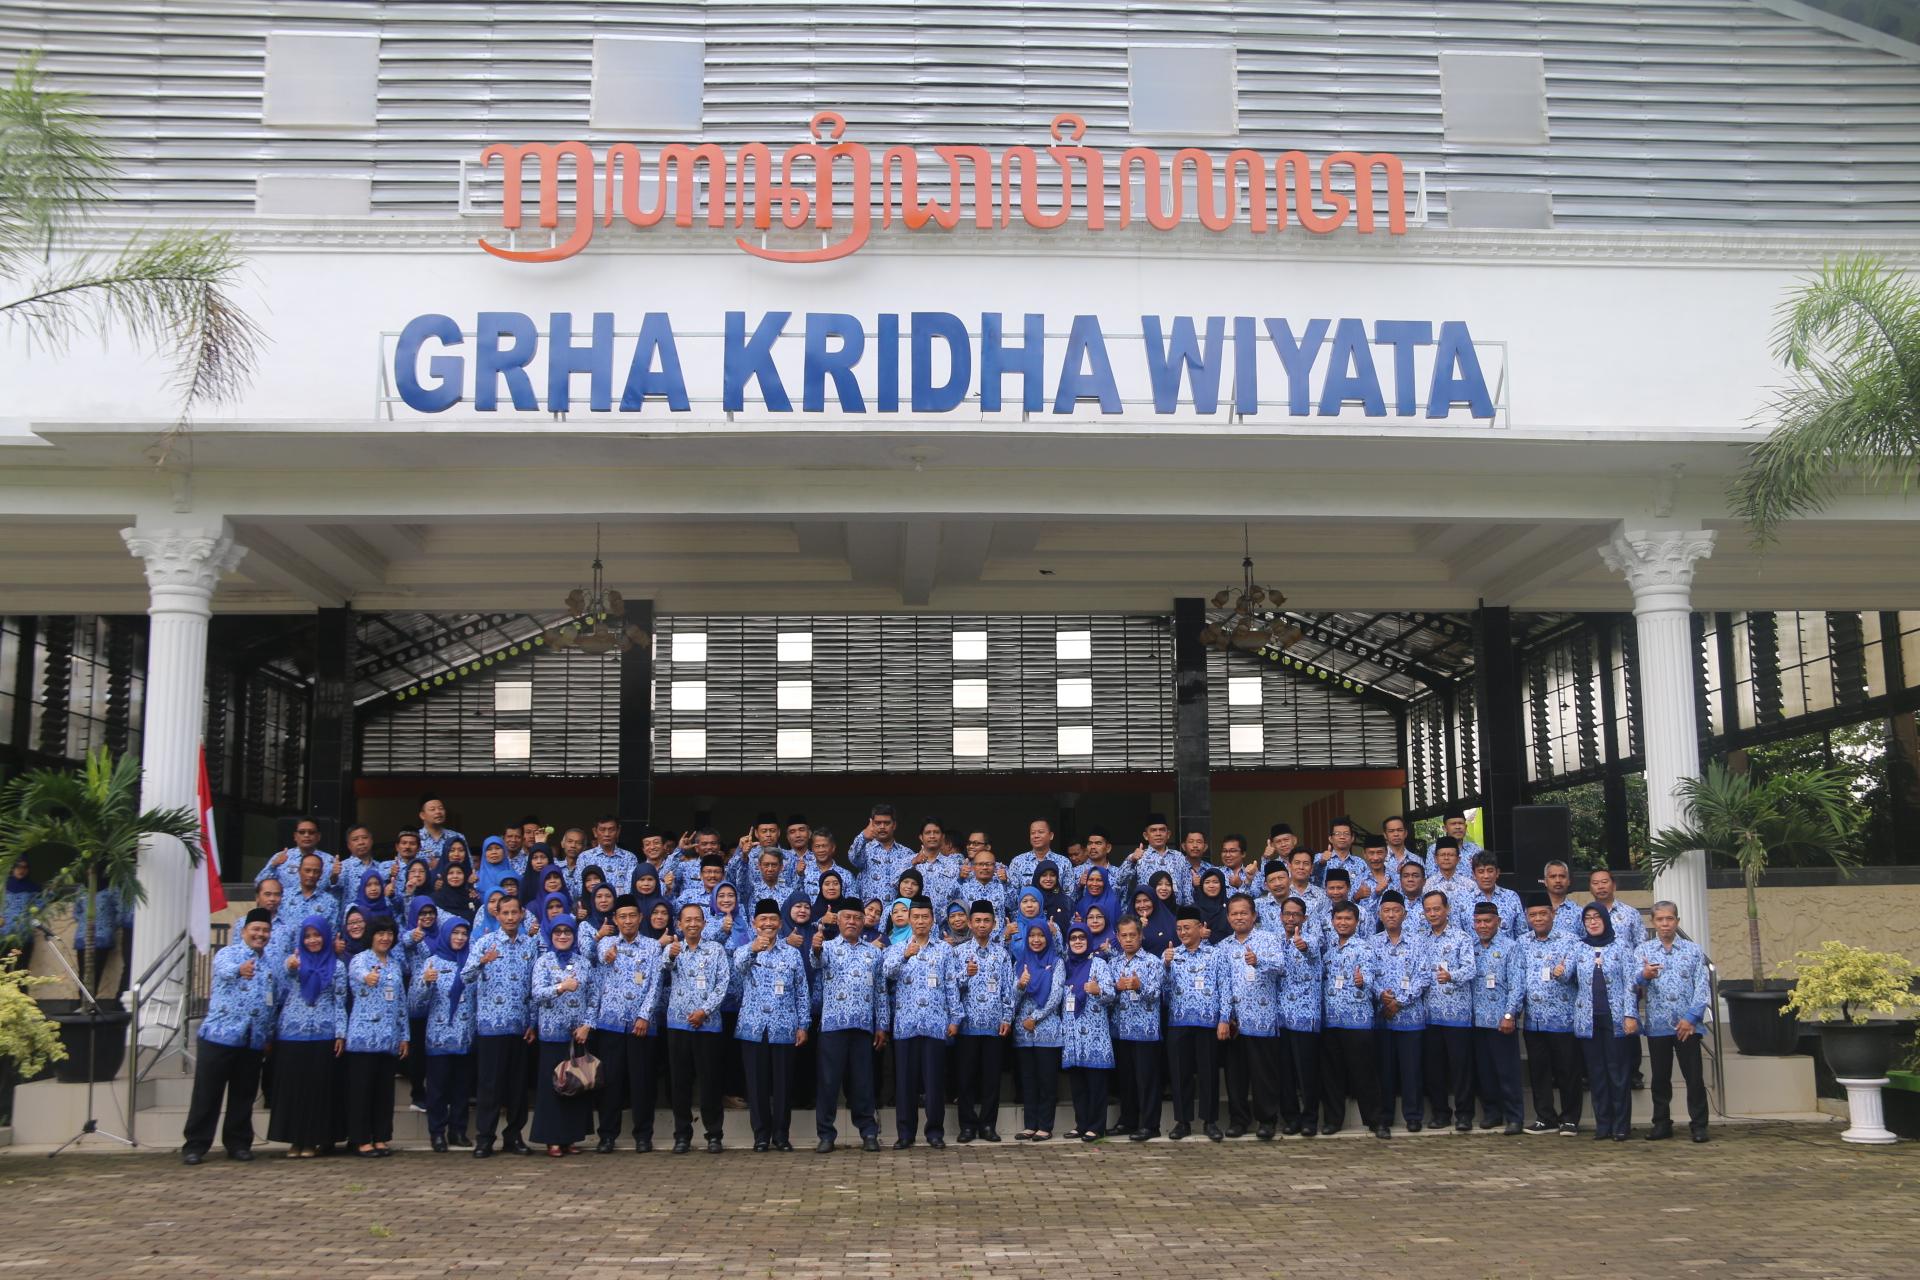 Apel pagi jajaran guru dan karyawan SMK Negeri 1 Magelang di halaman gedung serbaguna Grha Kridha Wiyata SMK Negeri 1 Magelang.